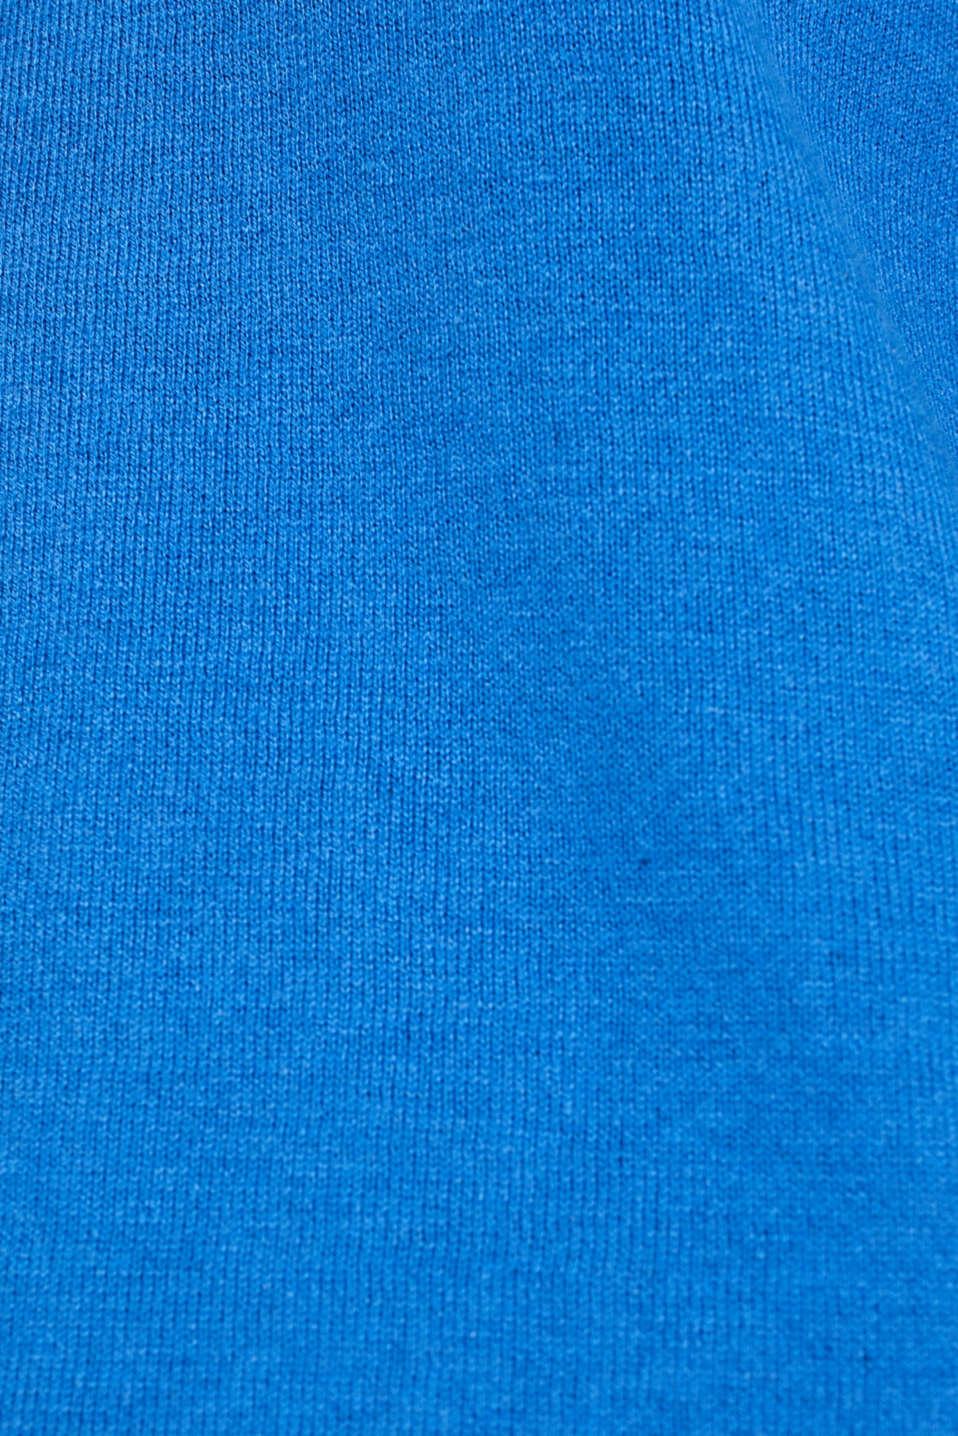 Jumper, organic cotton, BRIGHT BLUE, detail image number 4